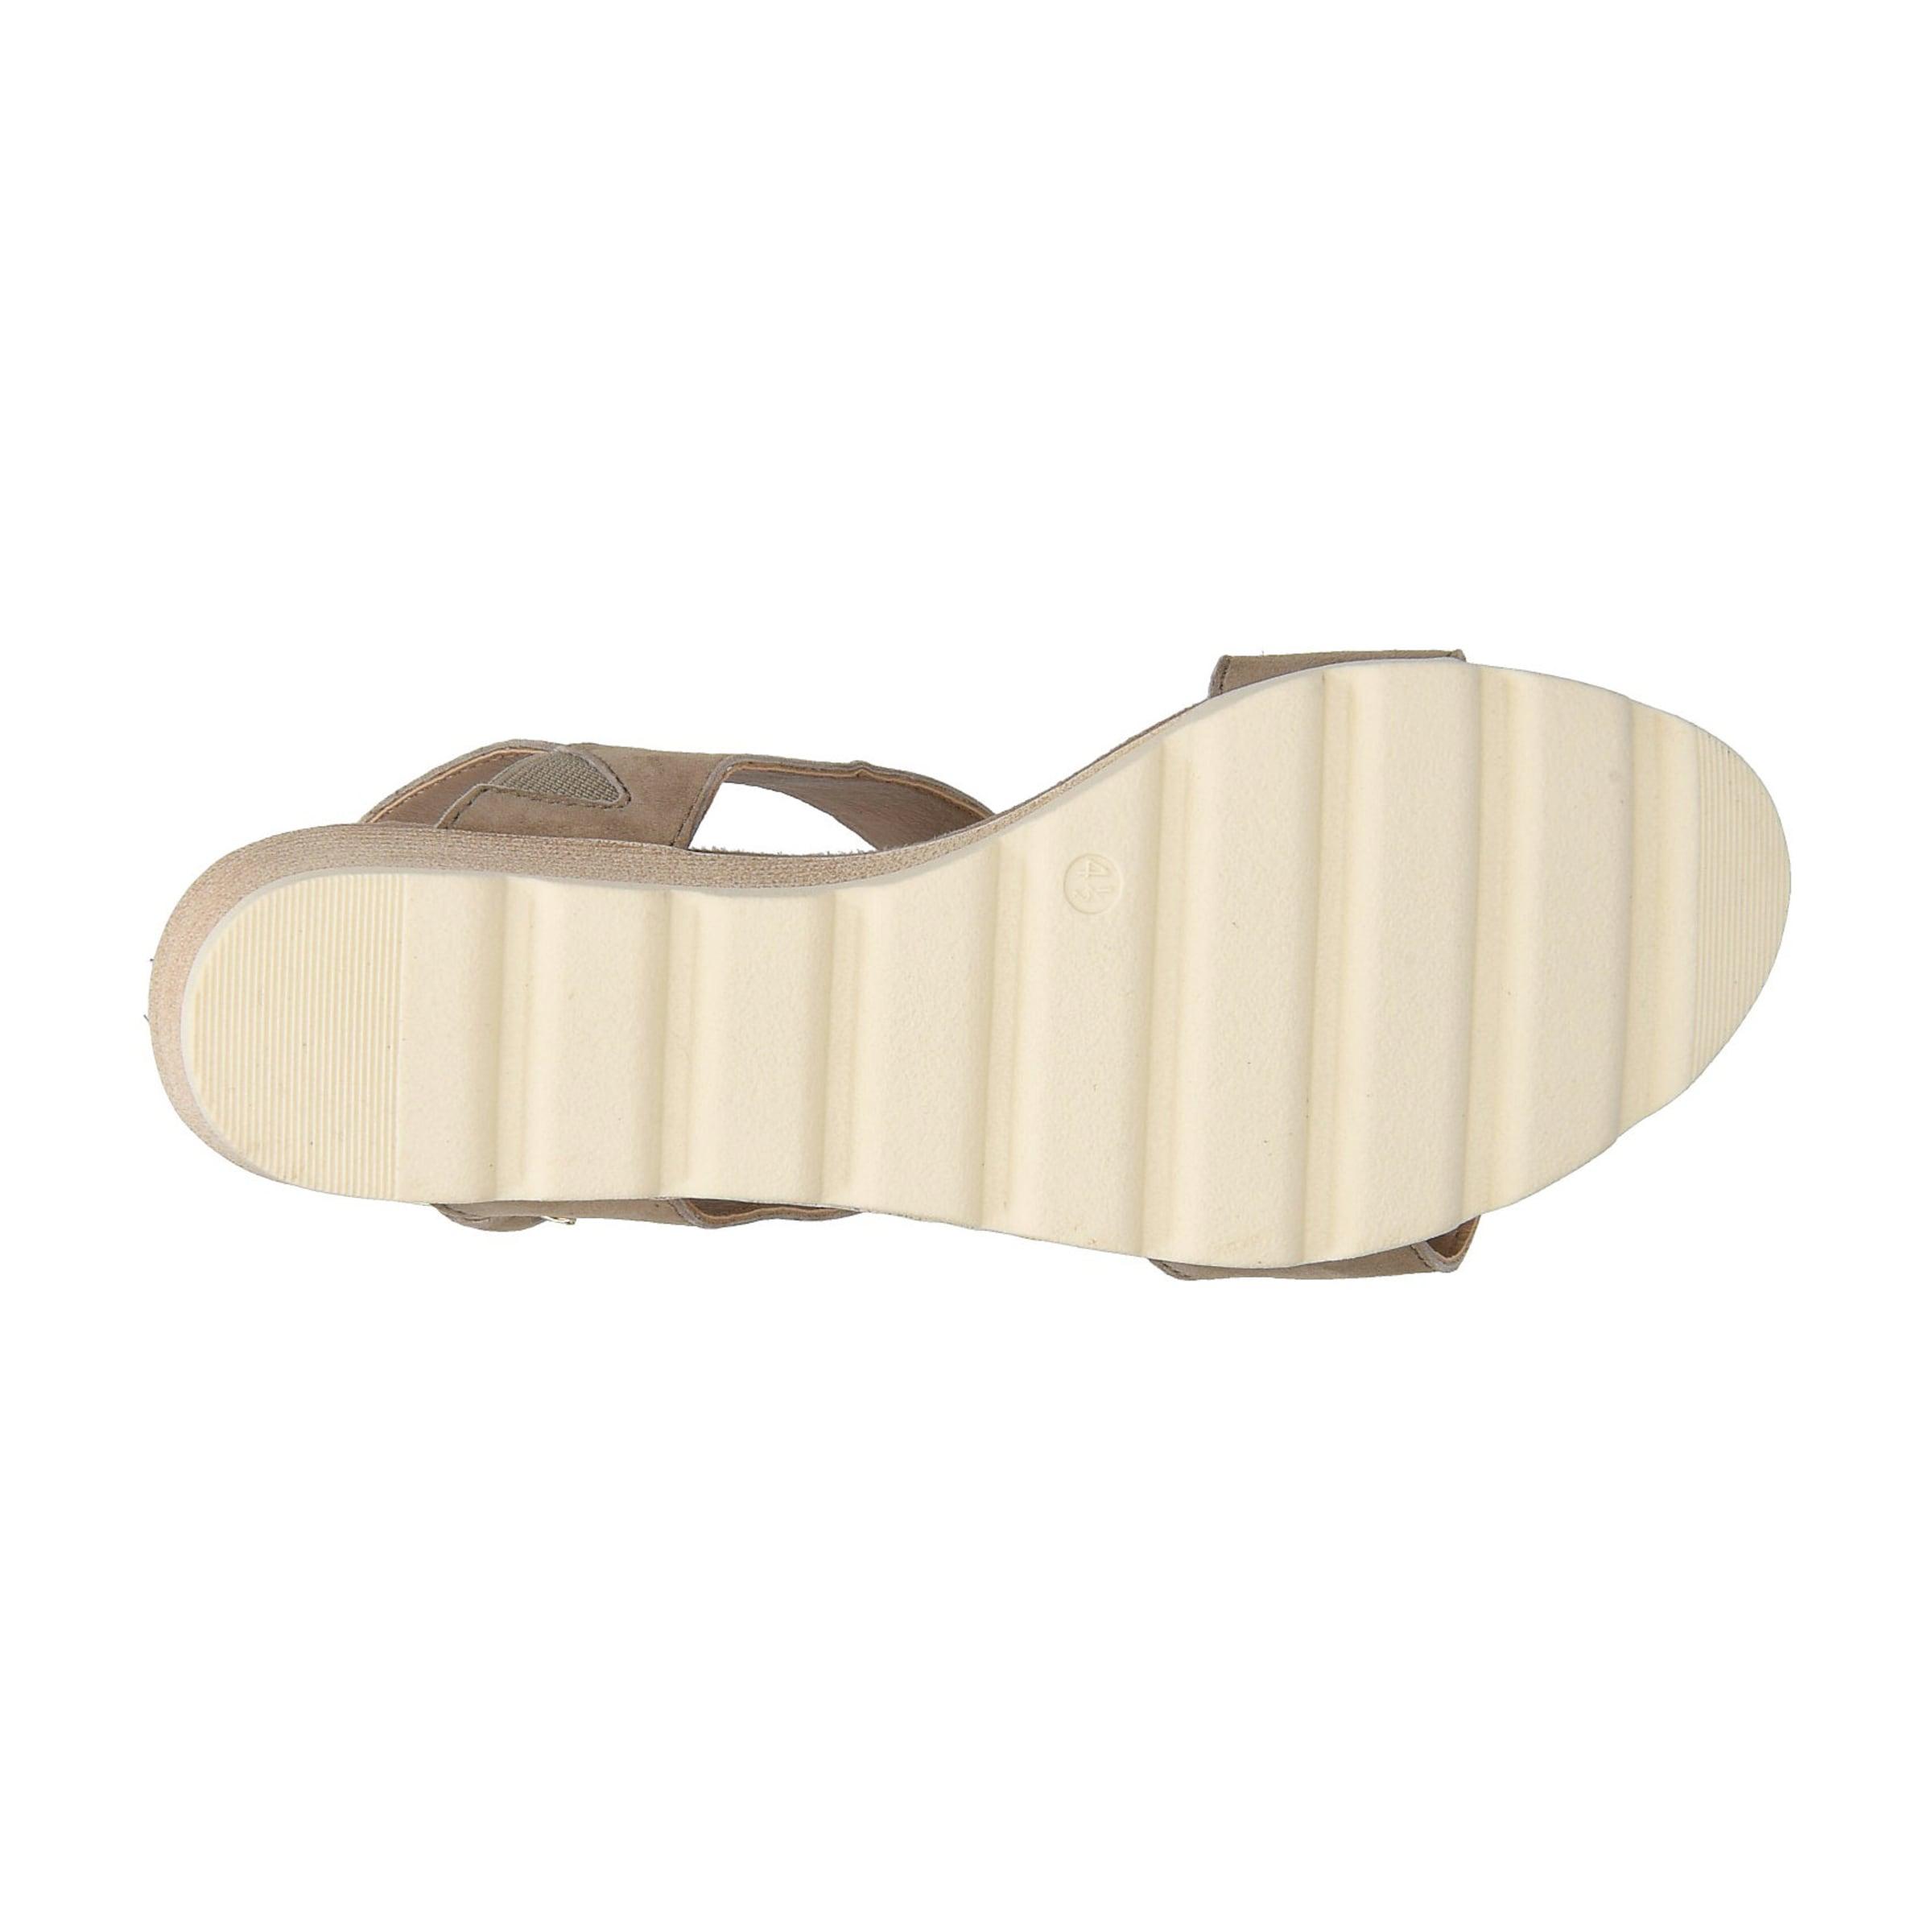 Sandaletten Sandaletten Sandaletten Caprice In Caprice Weiß Weiß Caprice HellbeigeDunkelbeige In HellbeigeDunkelbeige oxrBdCeW